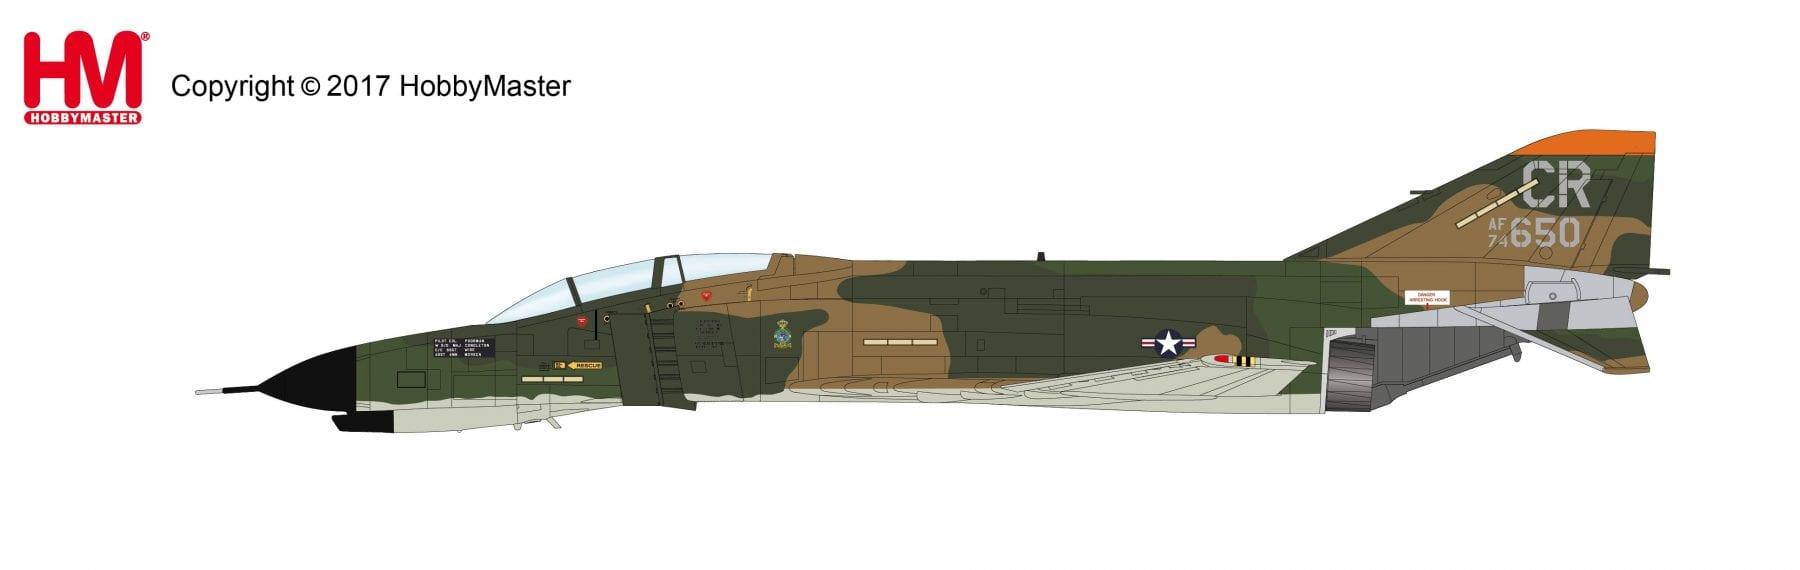 HOBBYMASTER HA1979 72ND USAF MCDONNELL-DOUGLAS F-4E PHANTOM II 74-650 CR